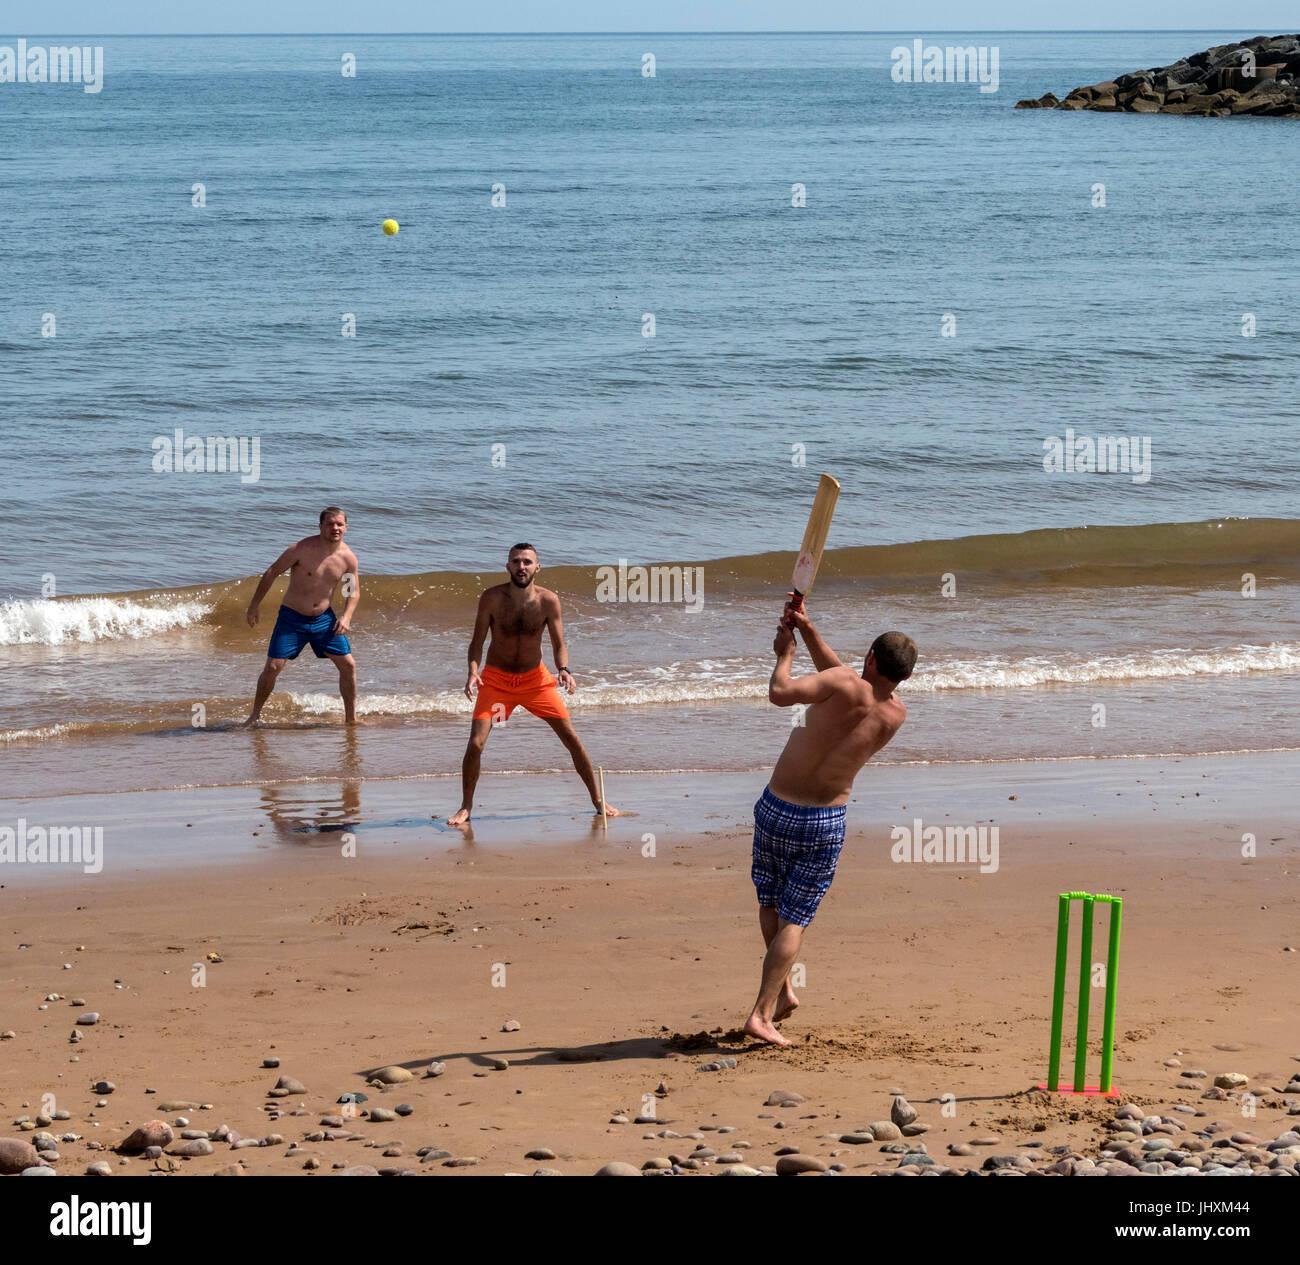 sidmouth-devon-uk-17th-july-2017-beach-c